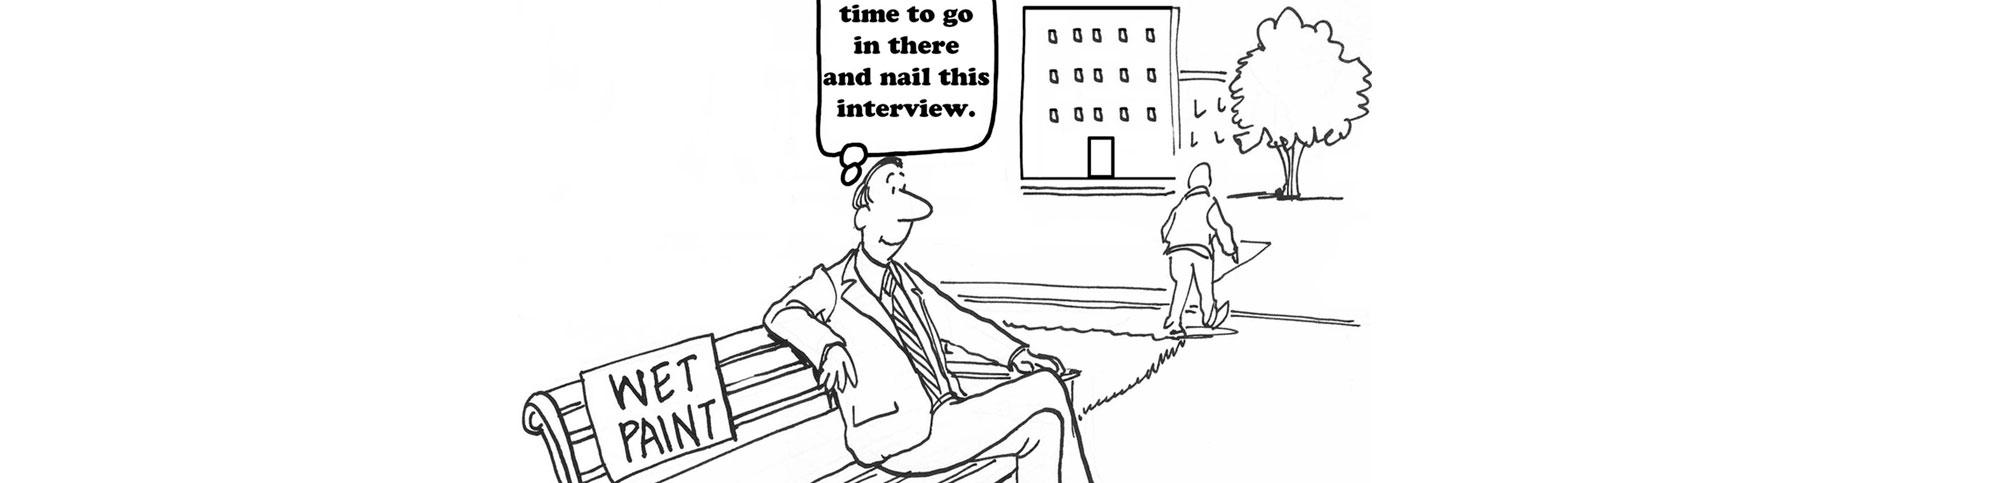 """interviewing job"""